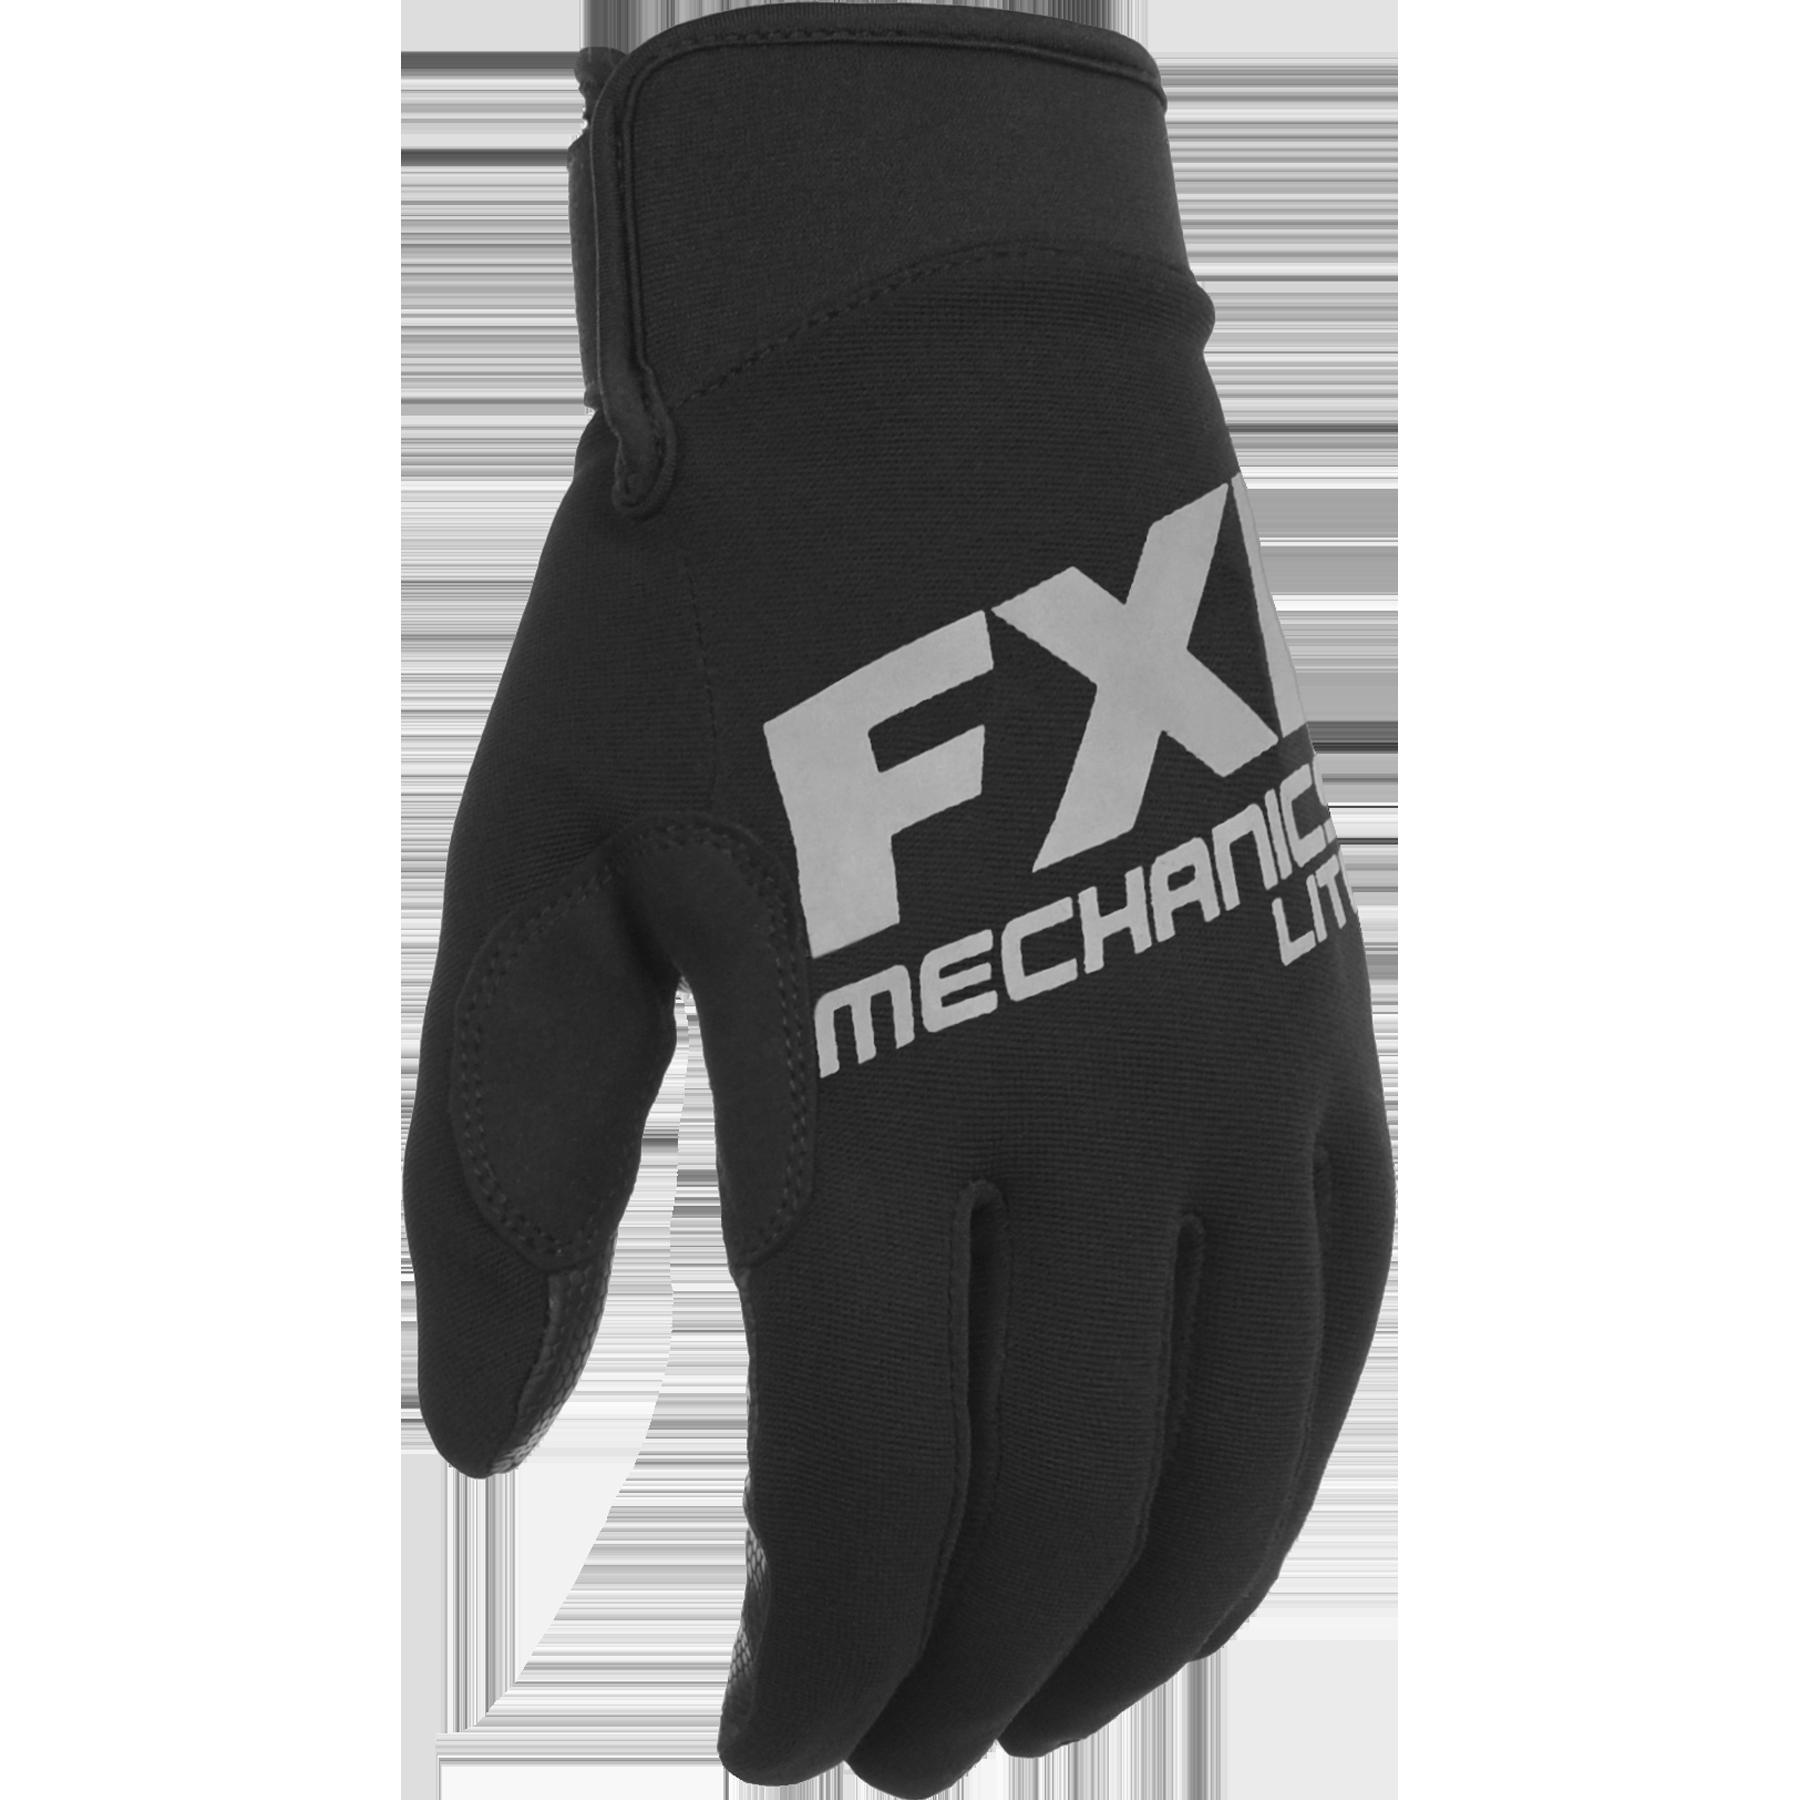 Mechanics Lite Glove 22 KI 2